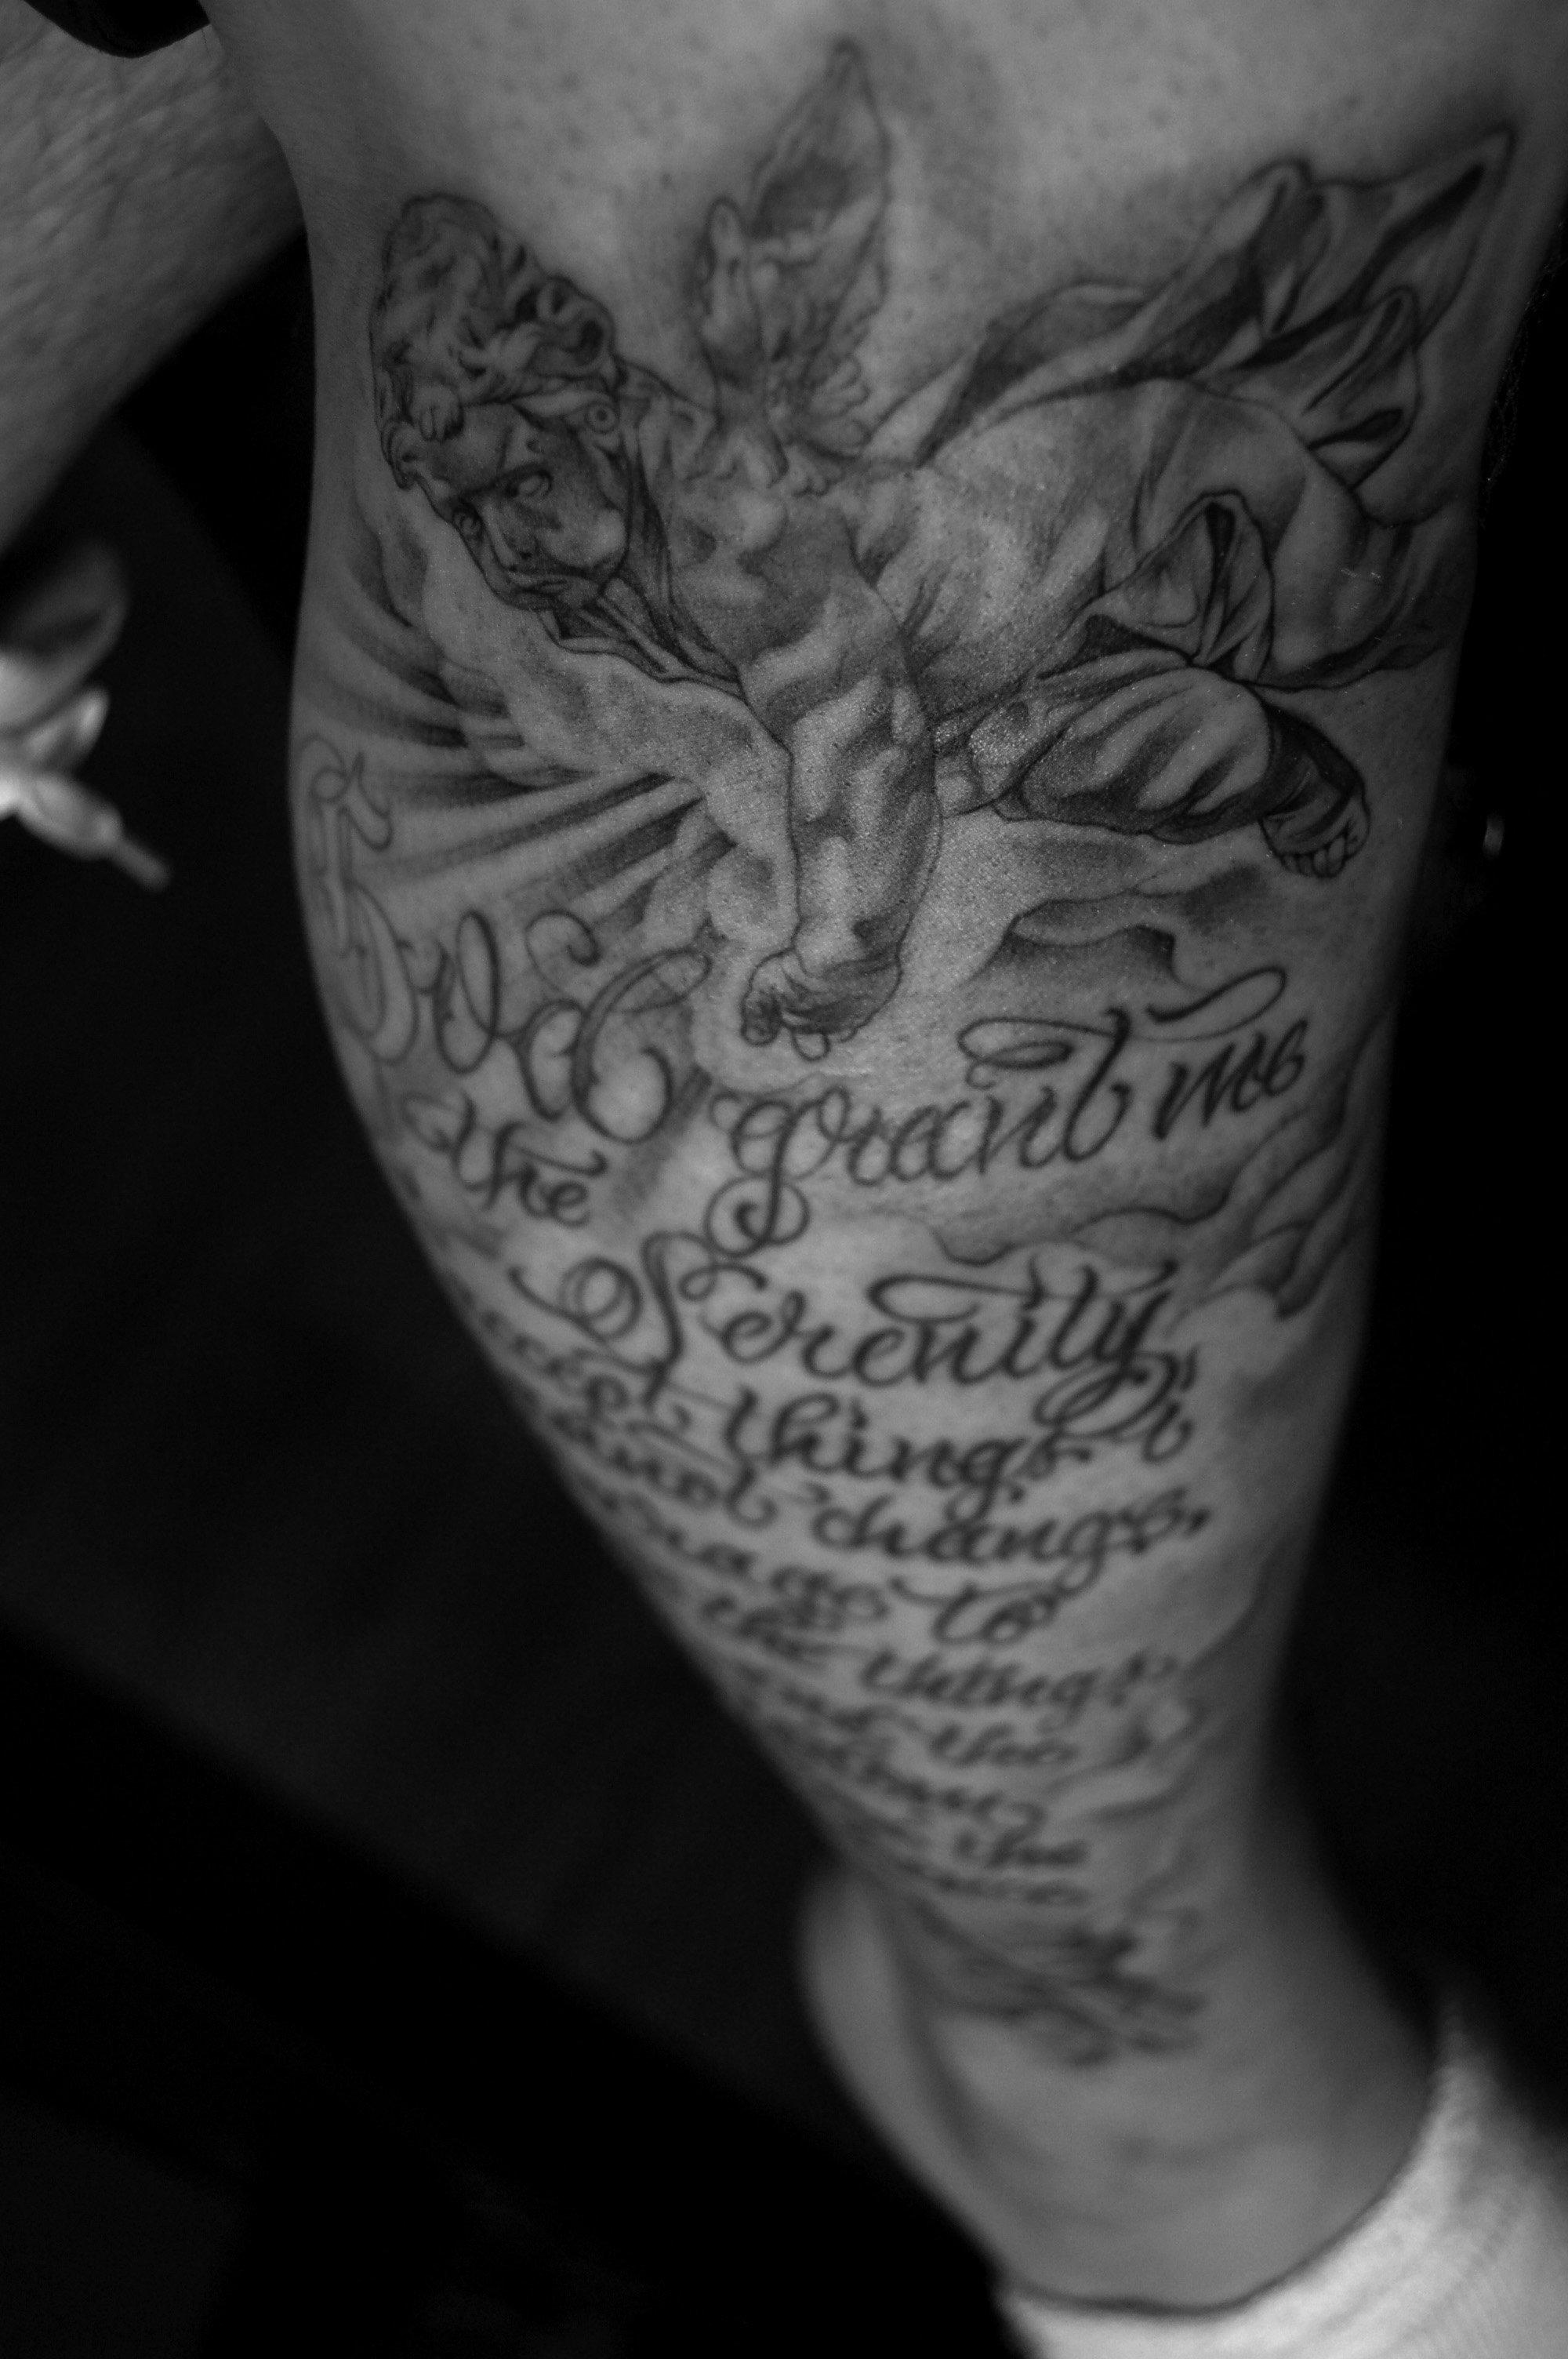 10 Famous Religious Tattoo Ideas For Men tattoo sleeve designs for men religious 1 tattoos pinterest 2021